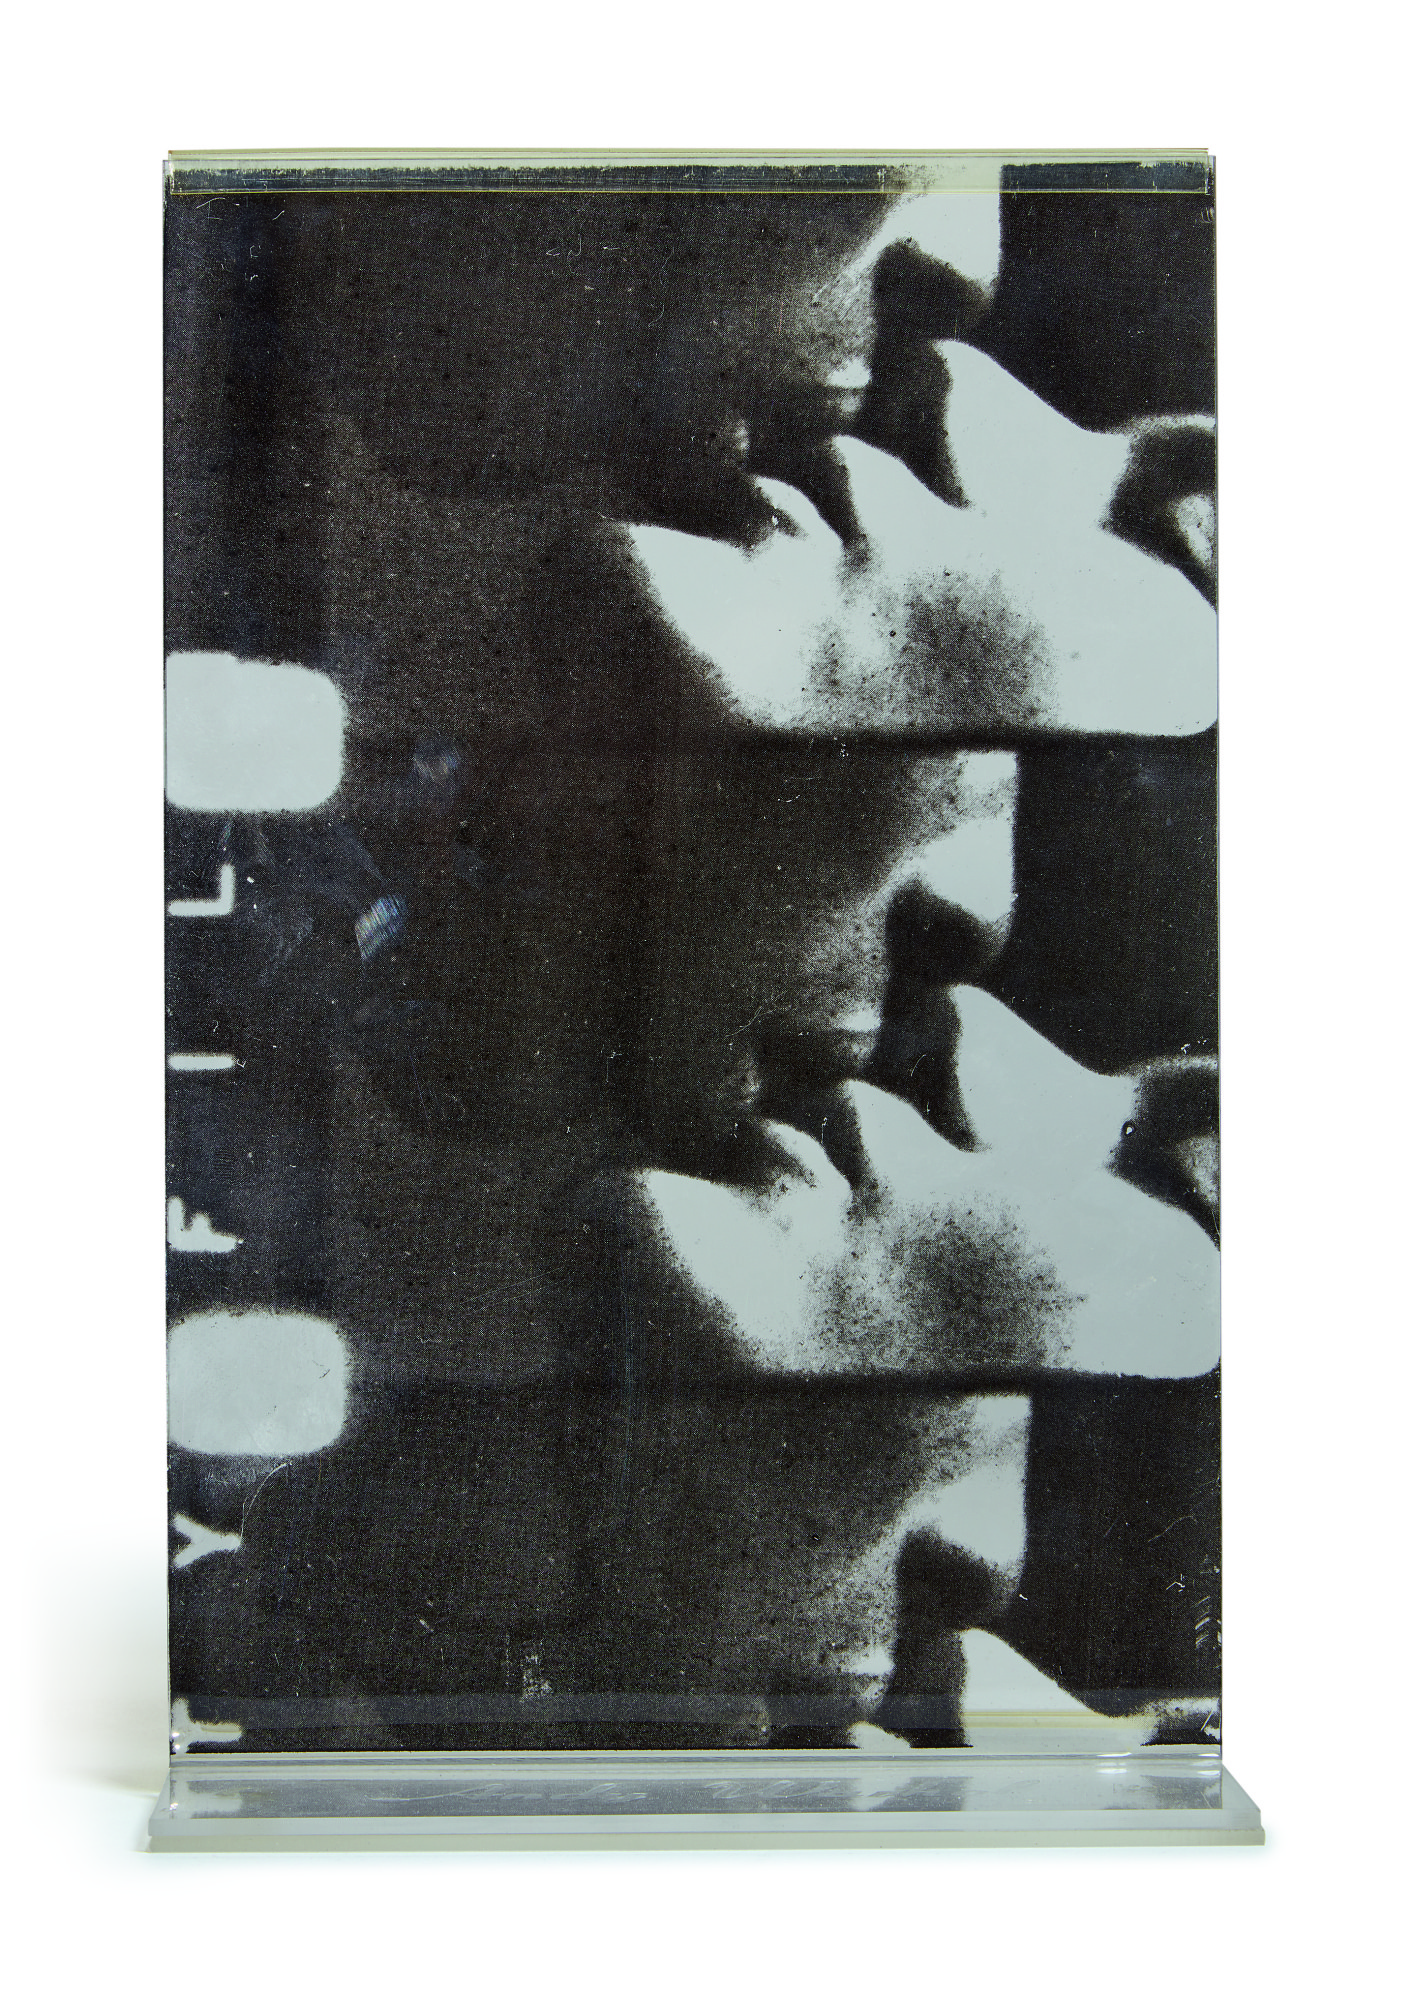 ANDY WARHOL  | KISS (FELDMAN & SCHELLMANN II.8)